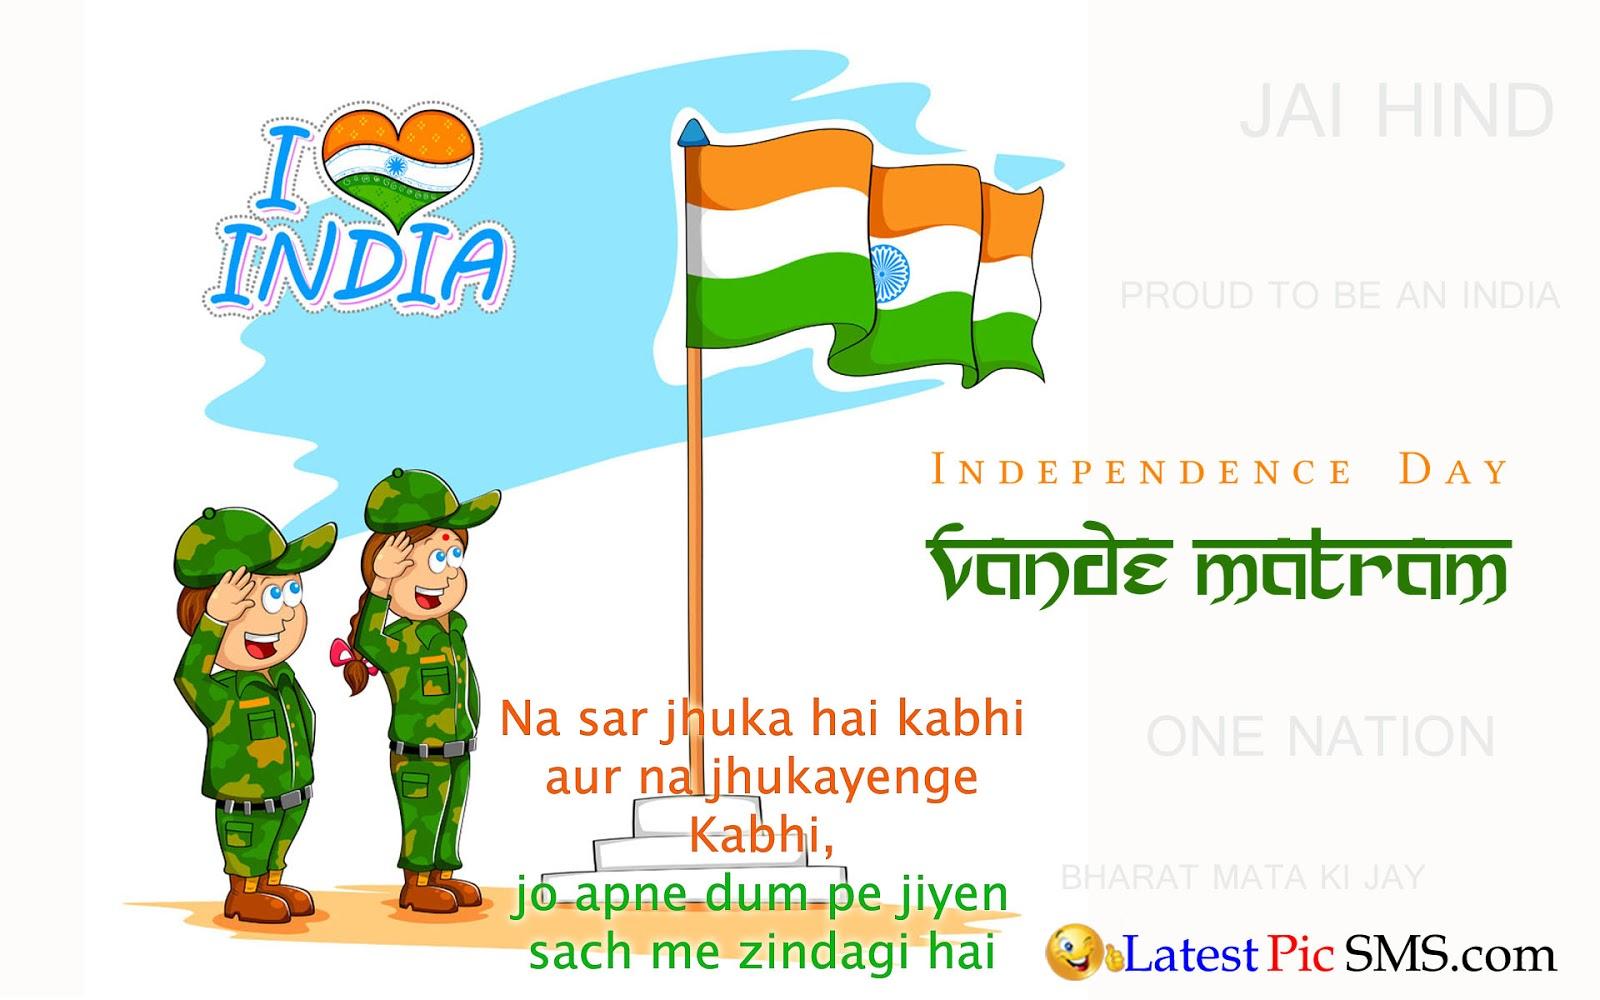 I love india vande mataram independece day Speech Wallpaper